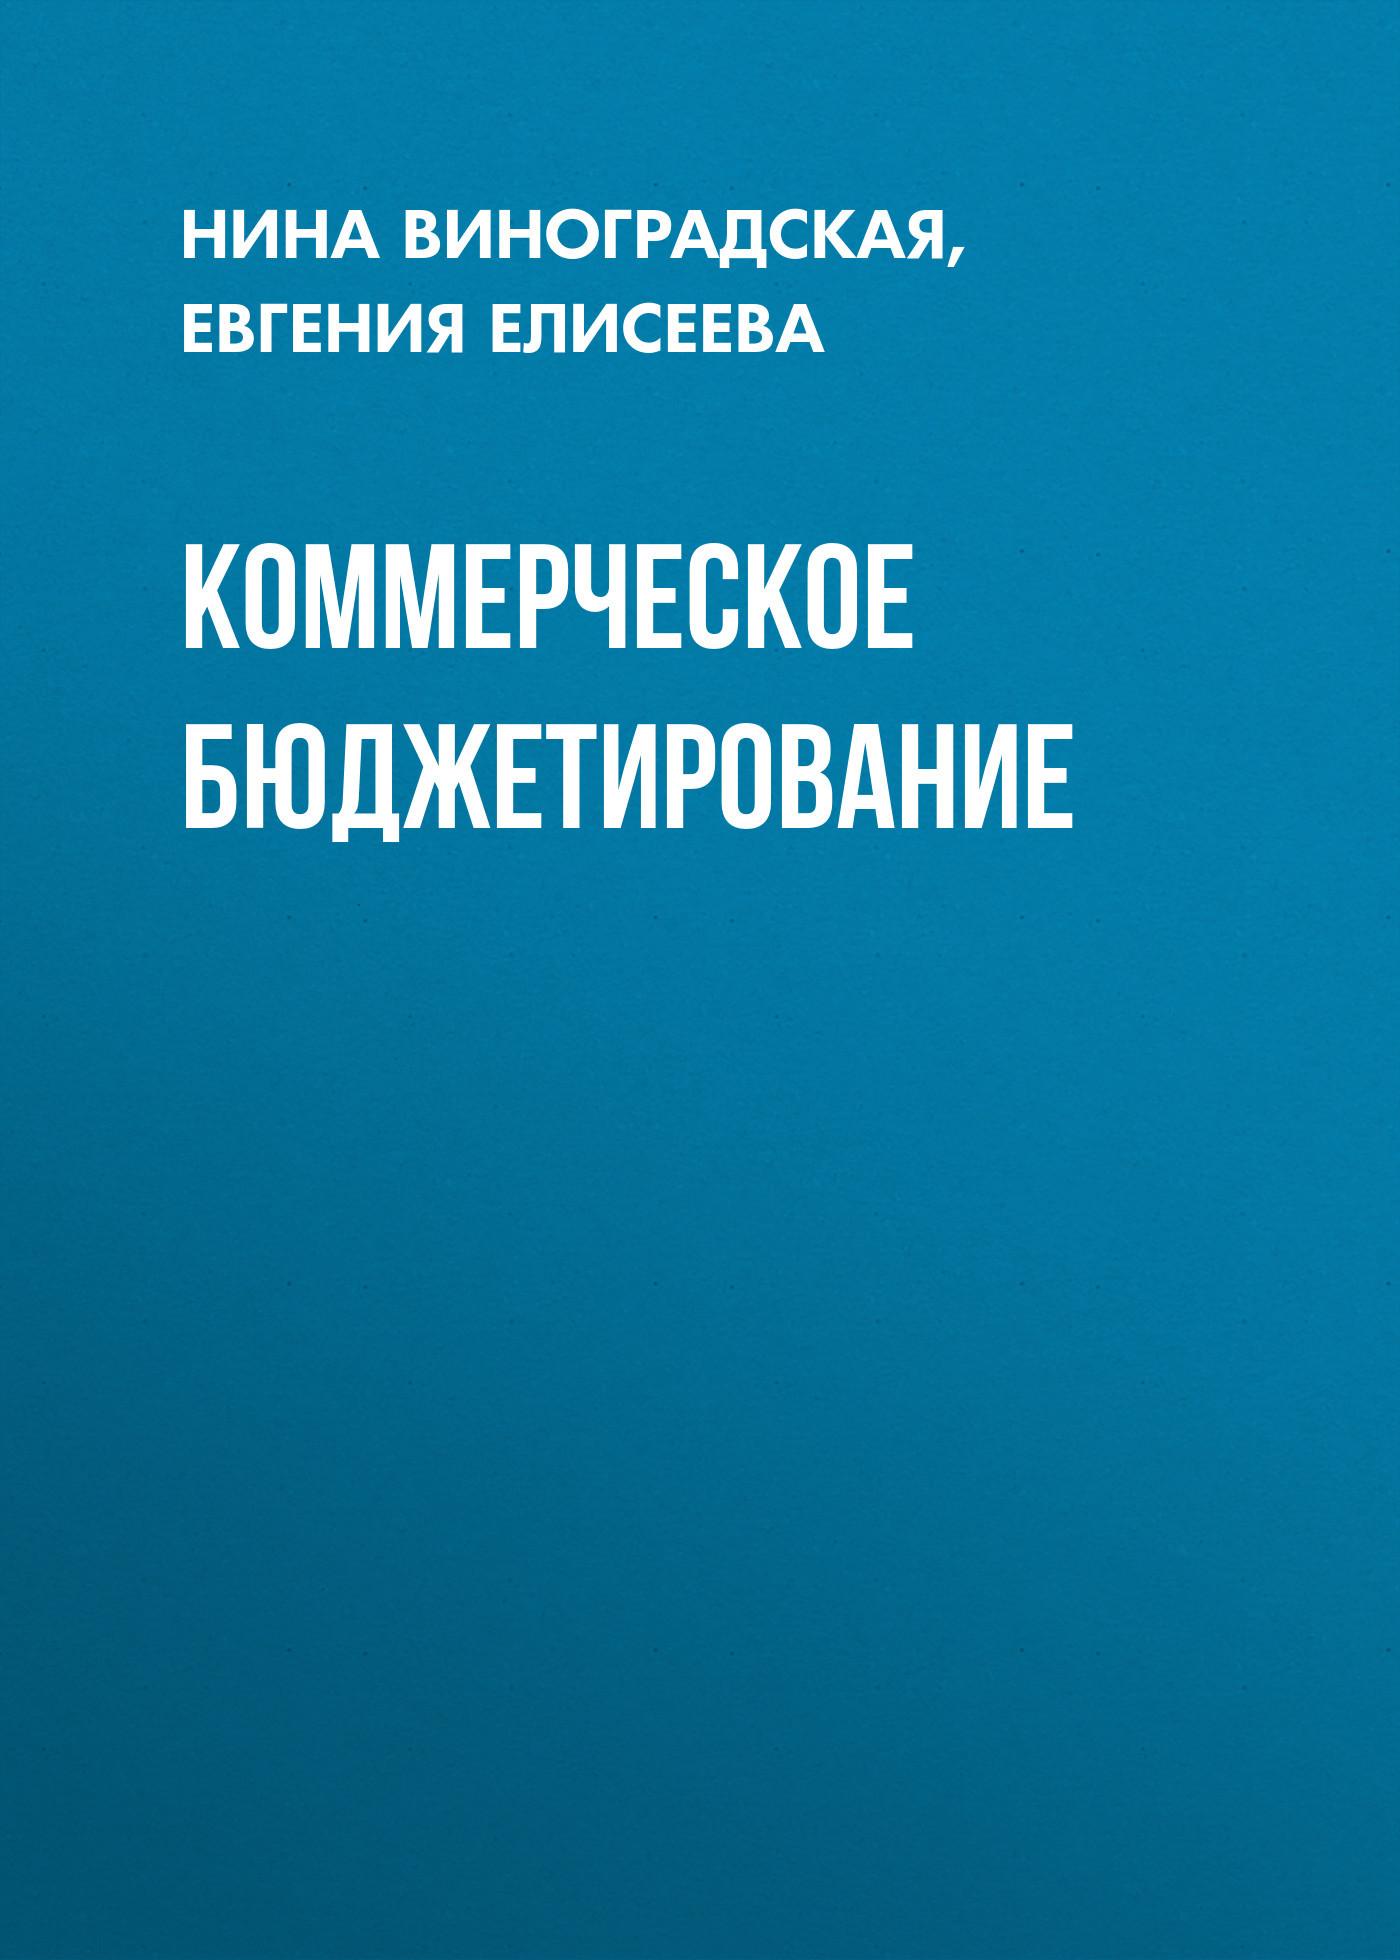 Евгения Елисеева бесплатно